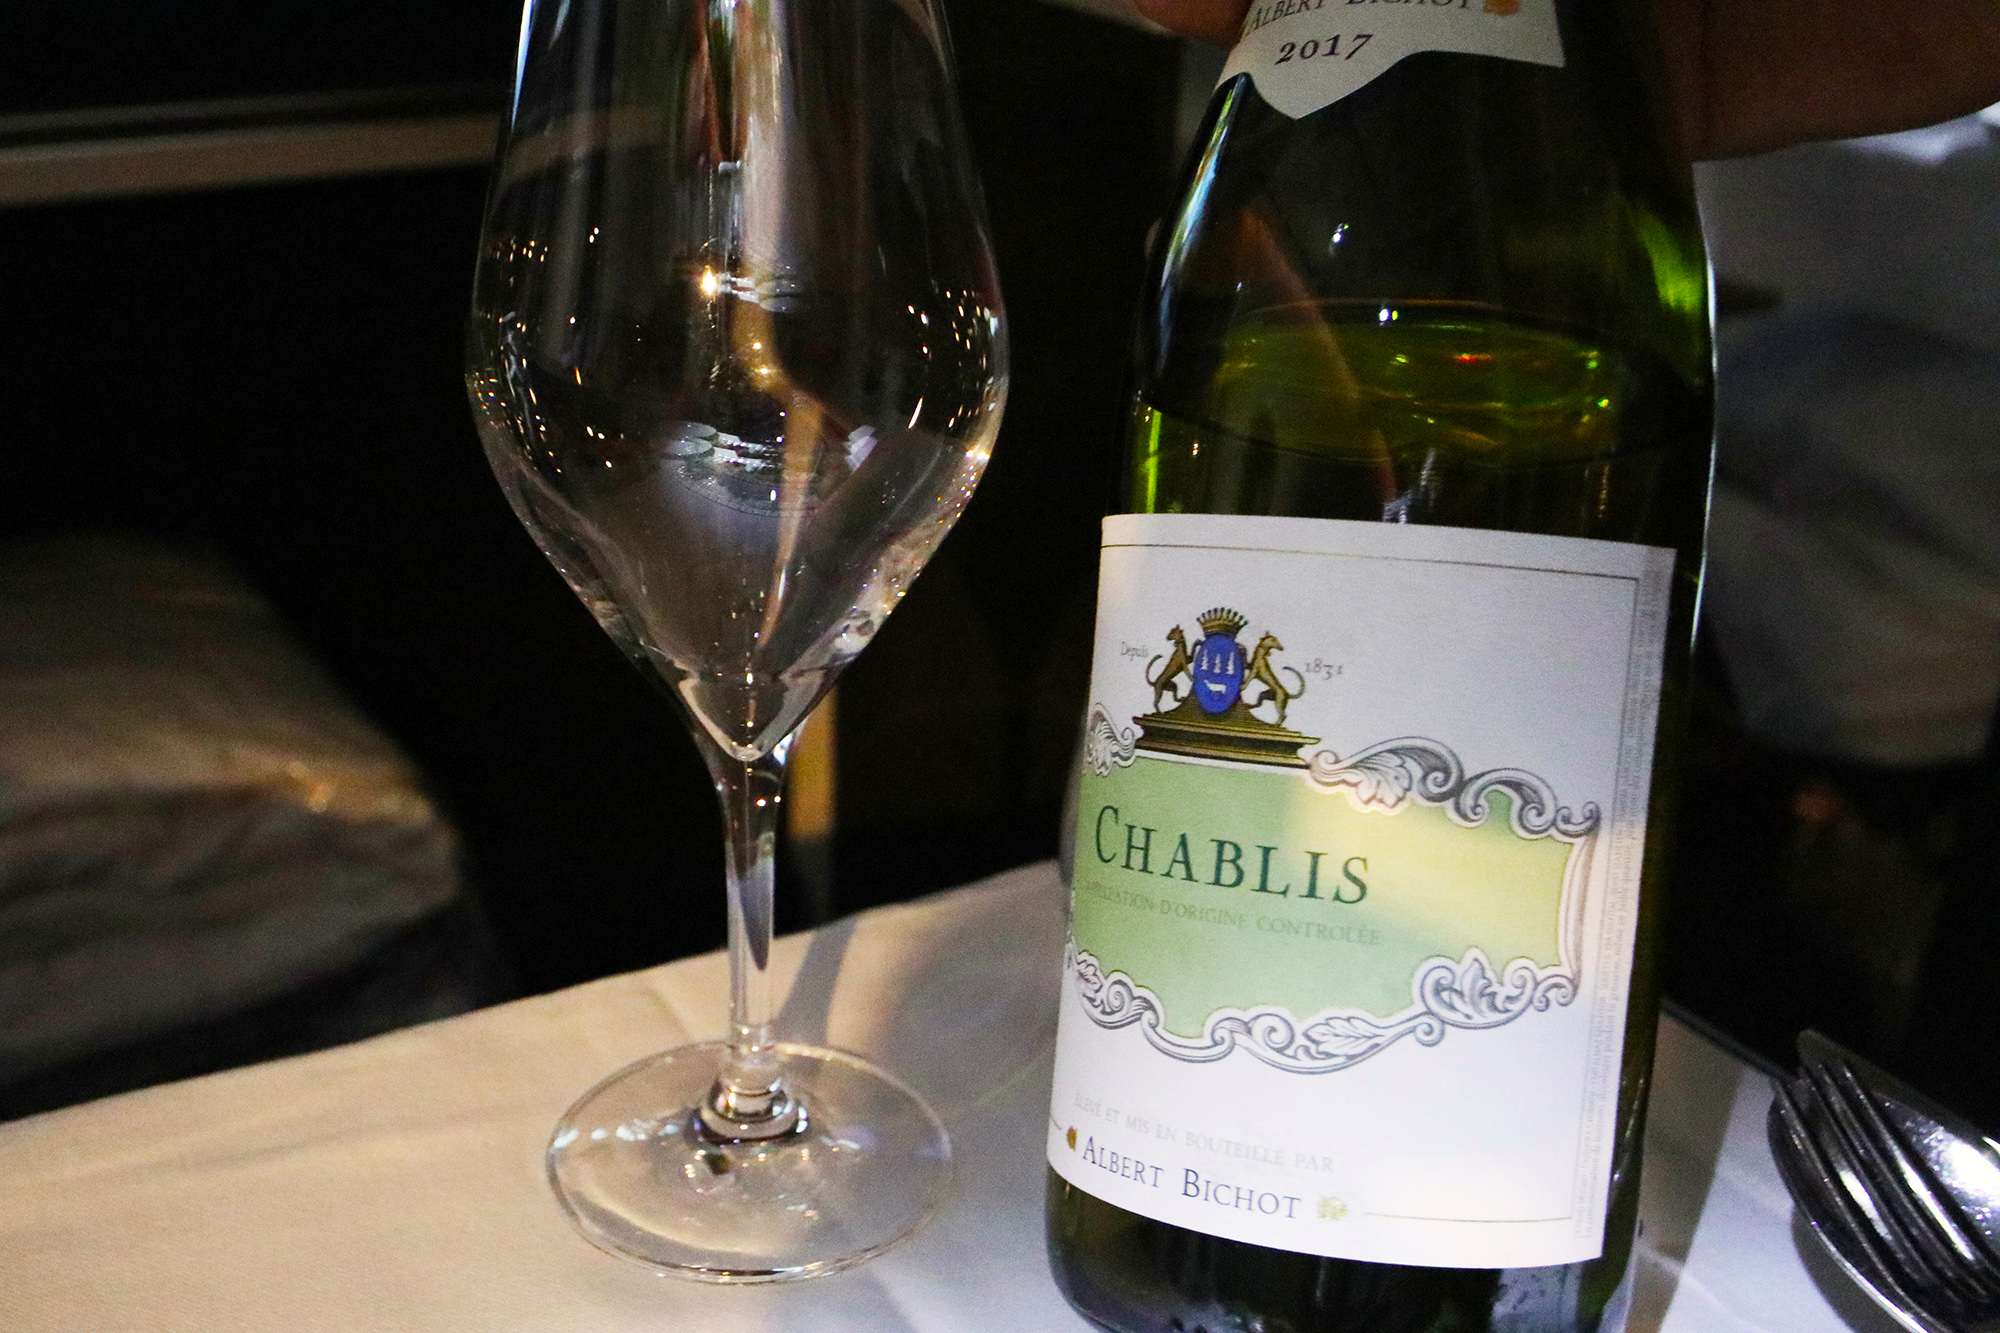 Wine Chablis.jpg